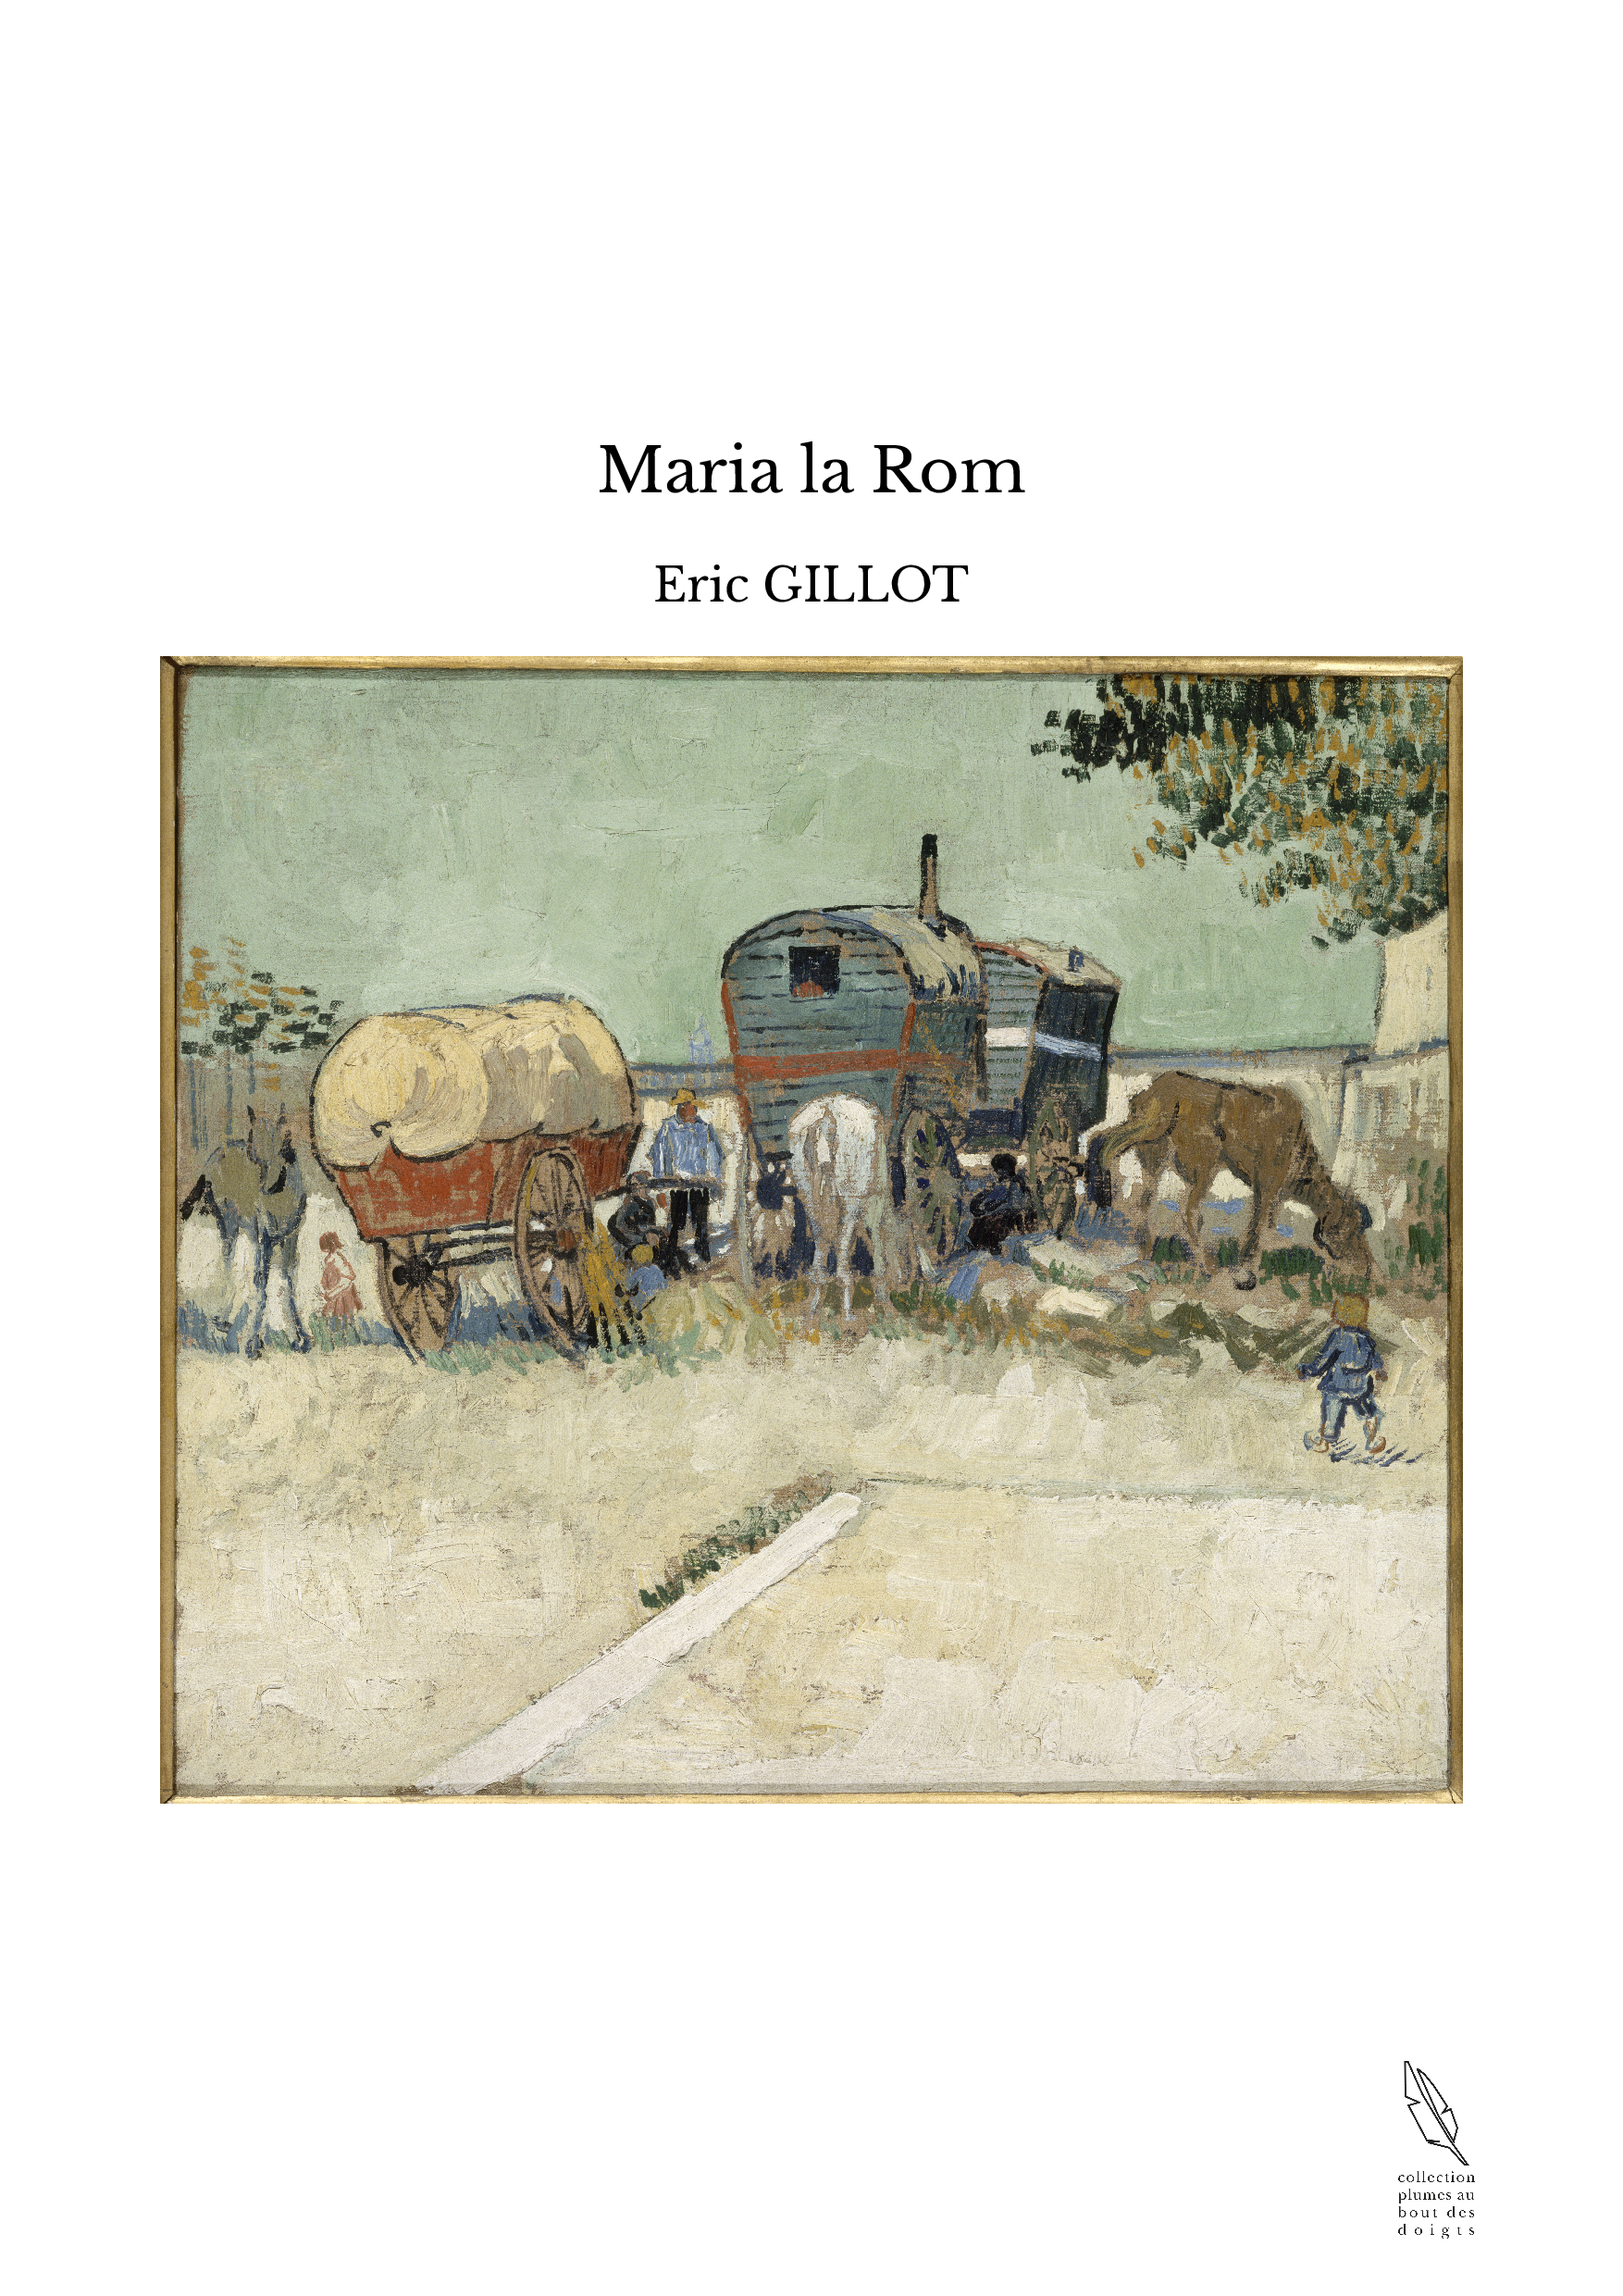 Maria la Rom